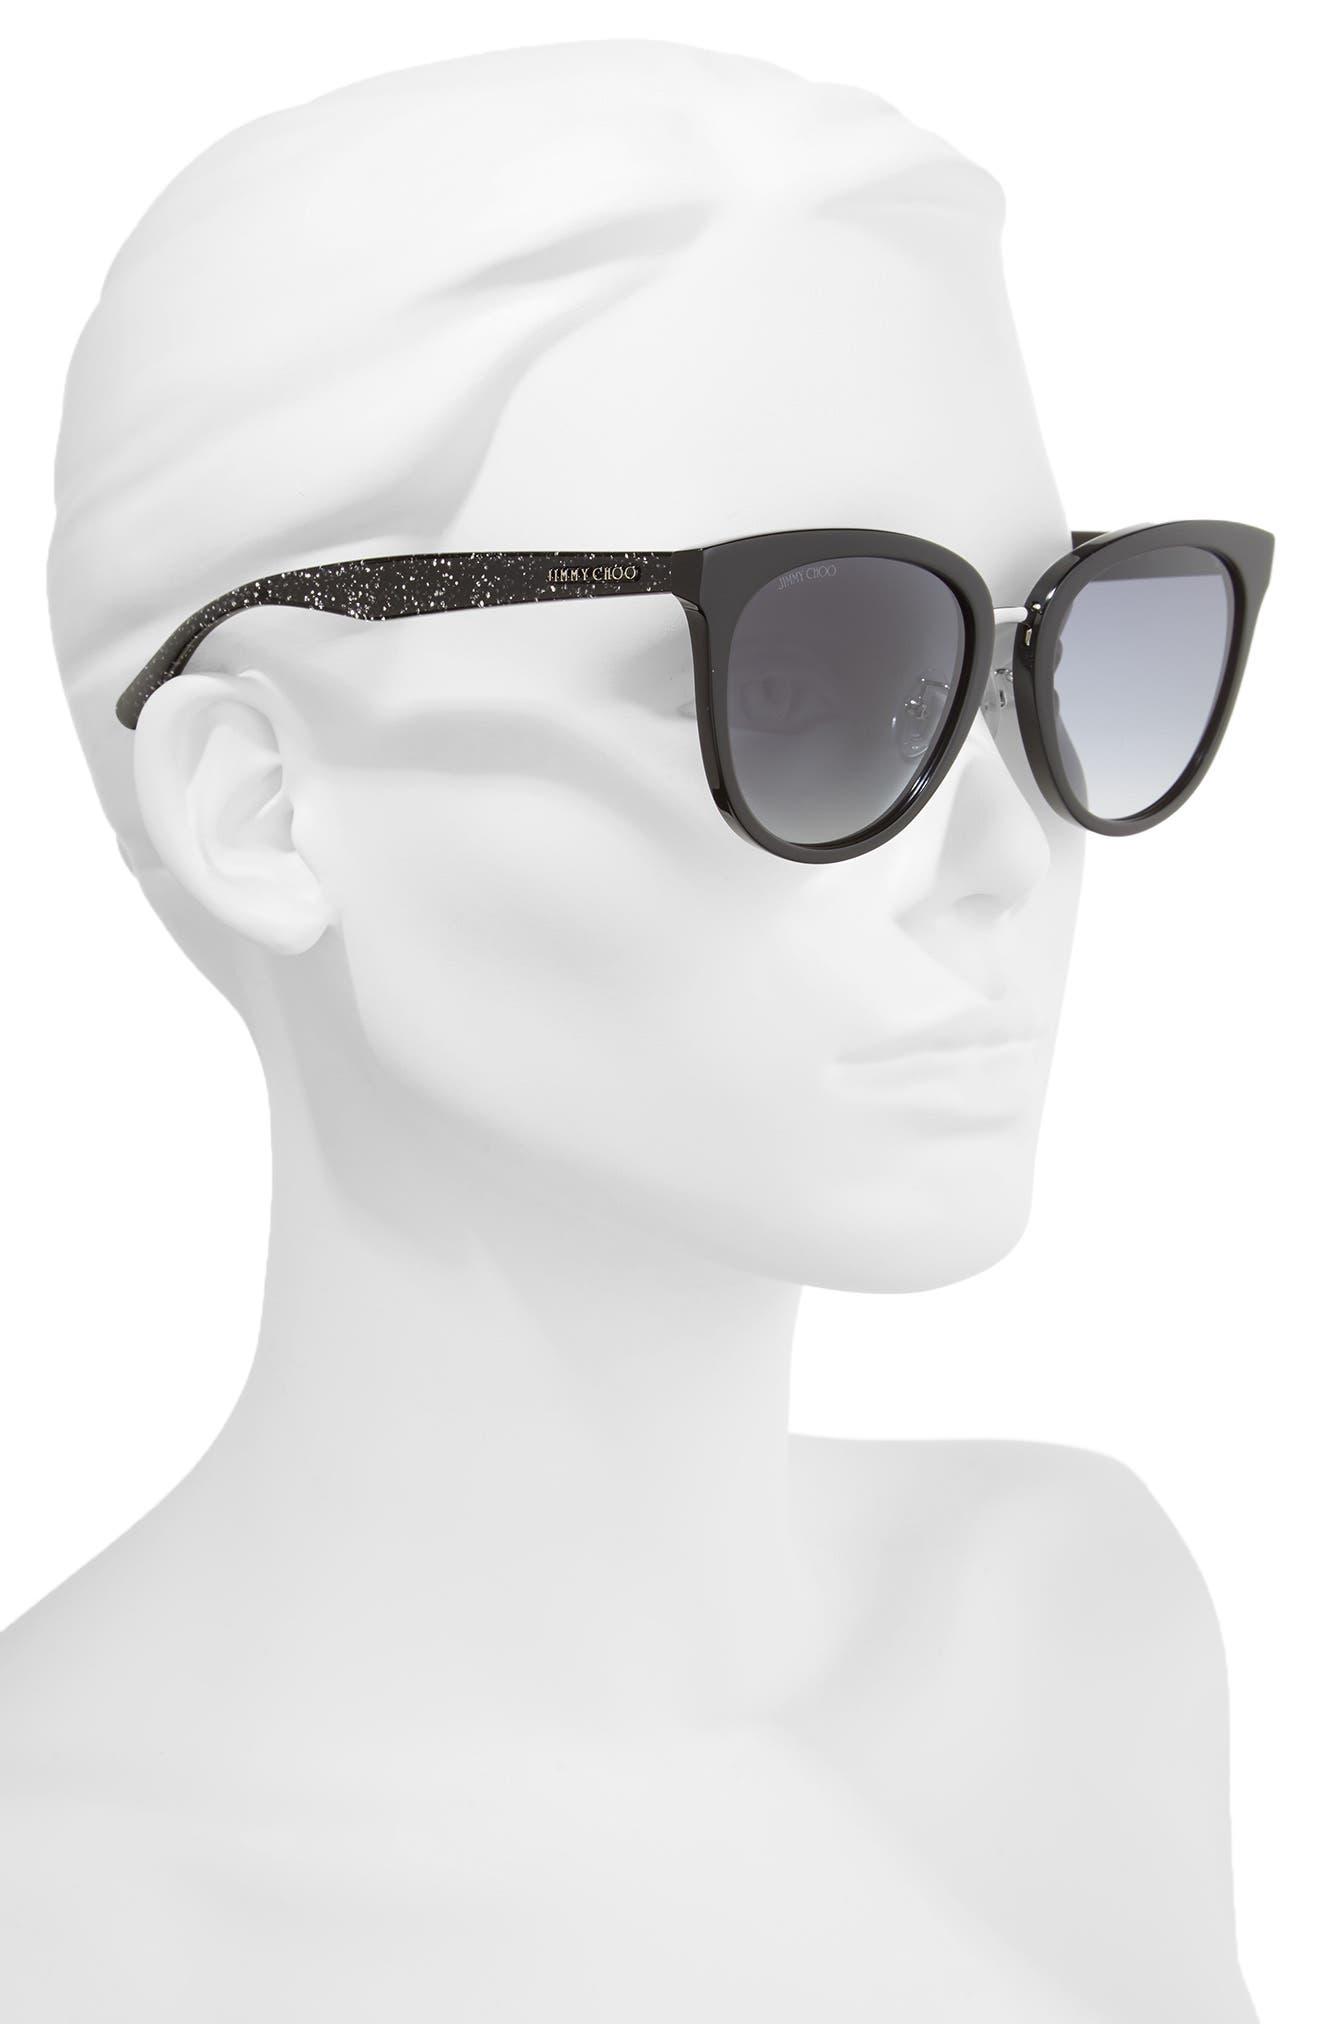 Cadefs 55mm Sunglasses,                             Alternate thumbnail 2, color,                             001